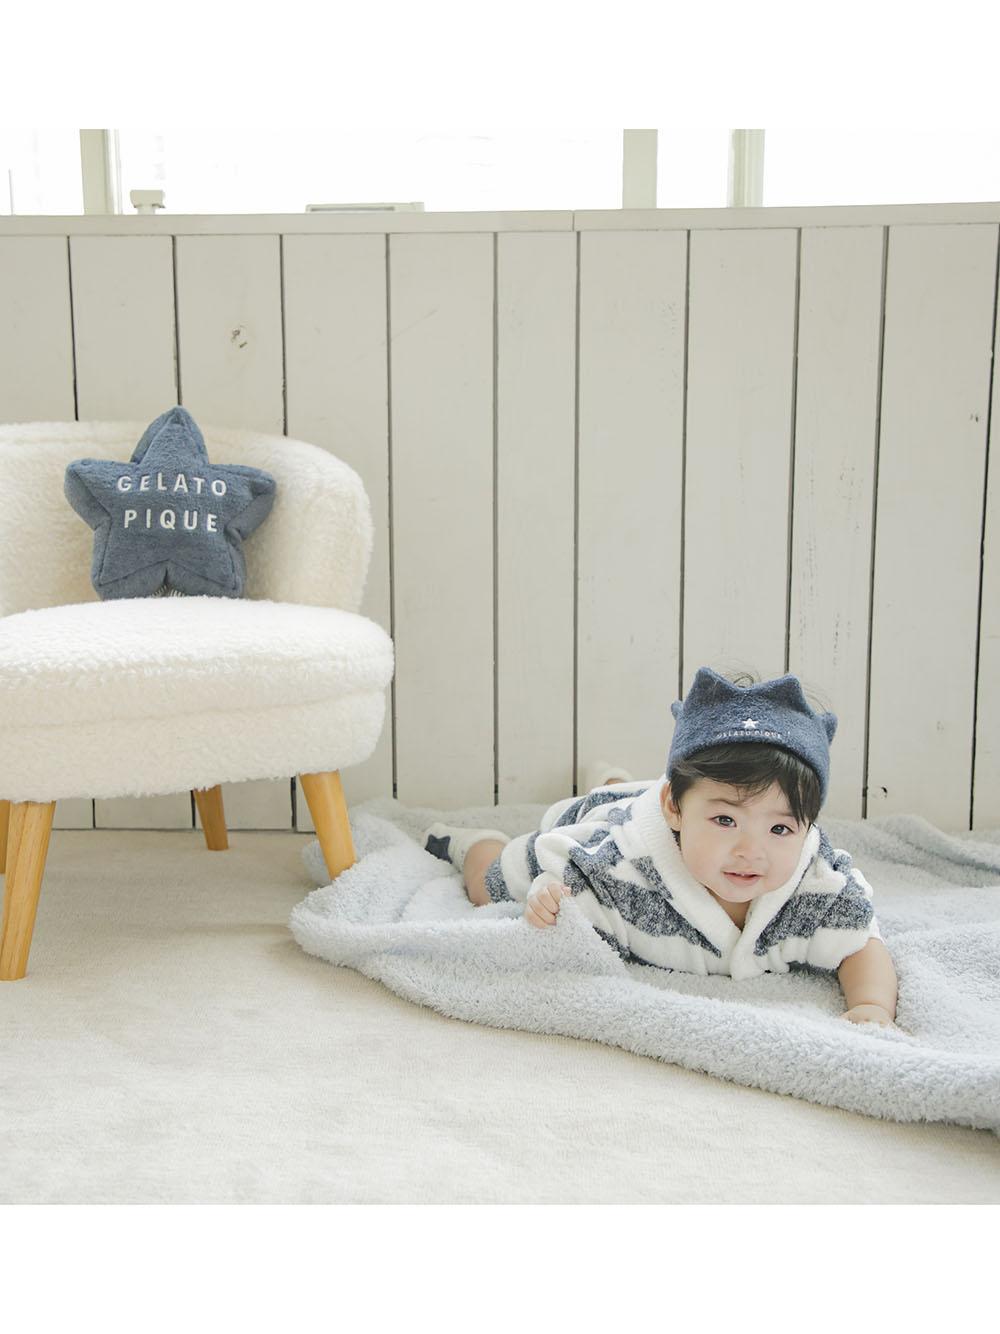 【BABY】'スムーズィー'メランジ2ボーダー baby ショートパンツ | PBNP212441